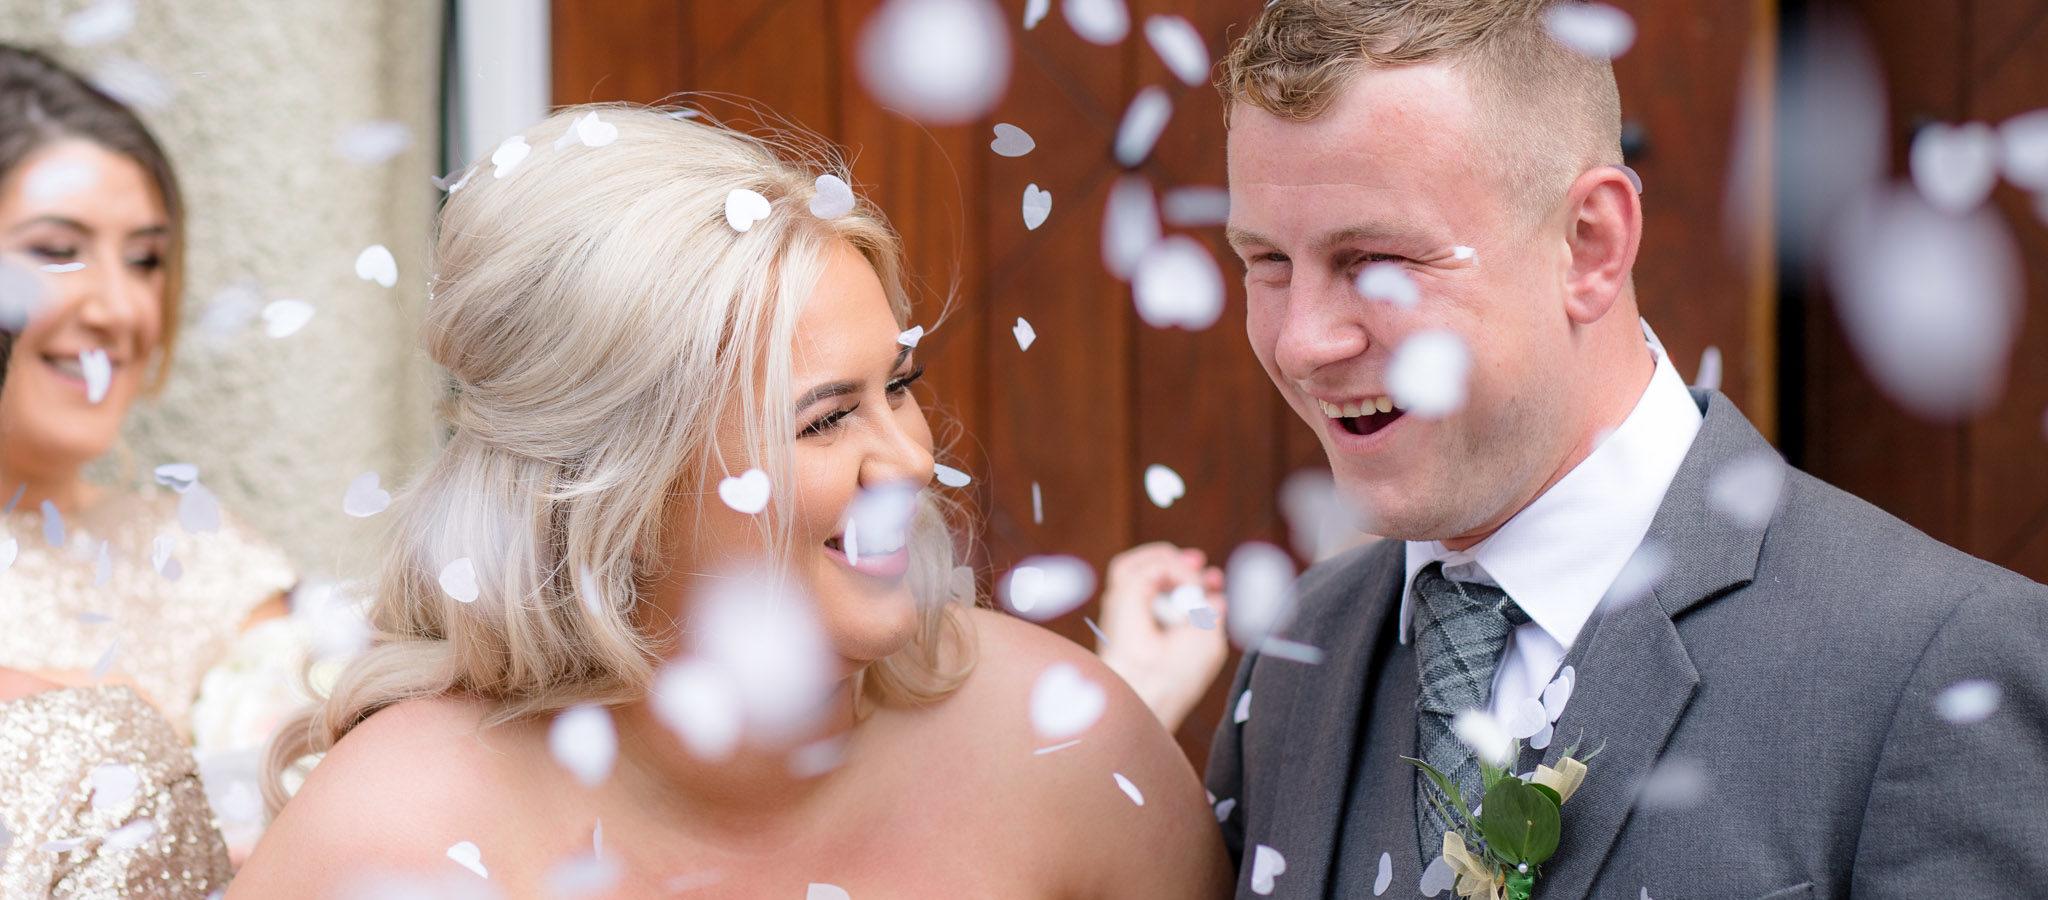 Confetti over bride and groom - Wedding photographer aberdeenshire, aberdeen, huntly, scotland - Debbie Dee Photography